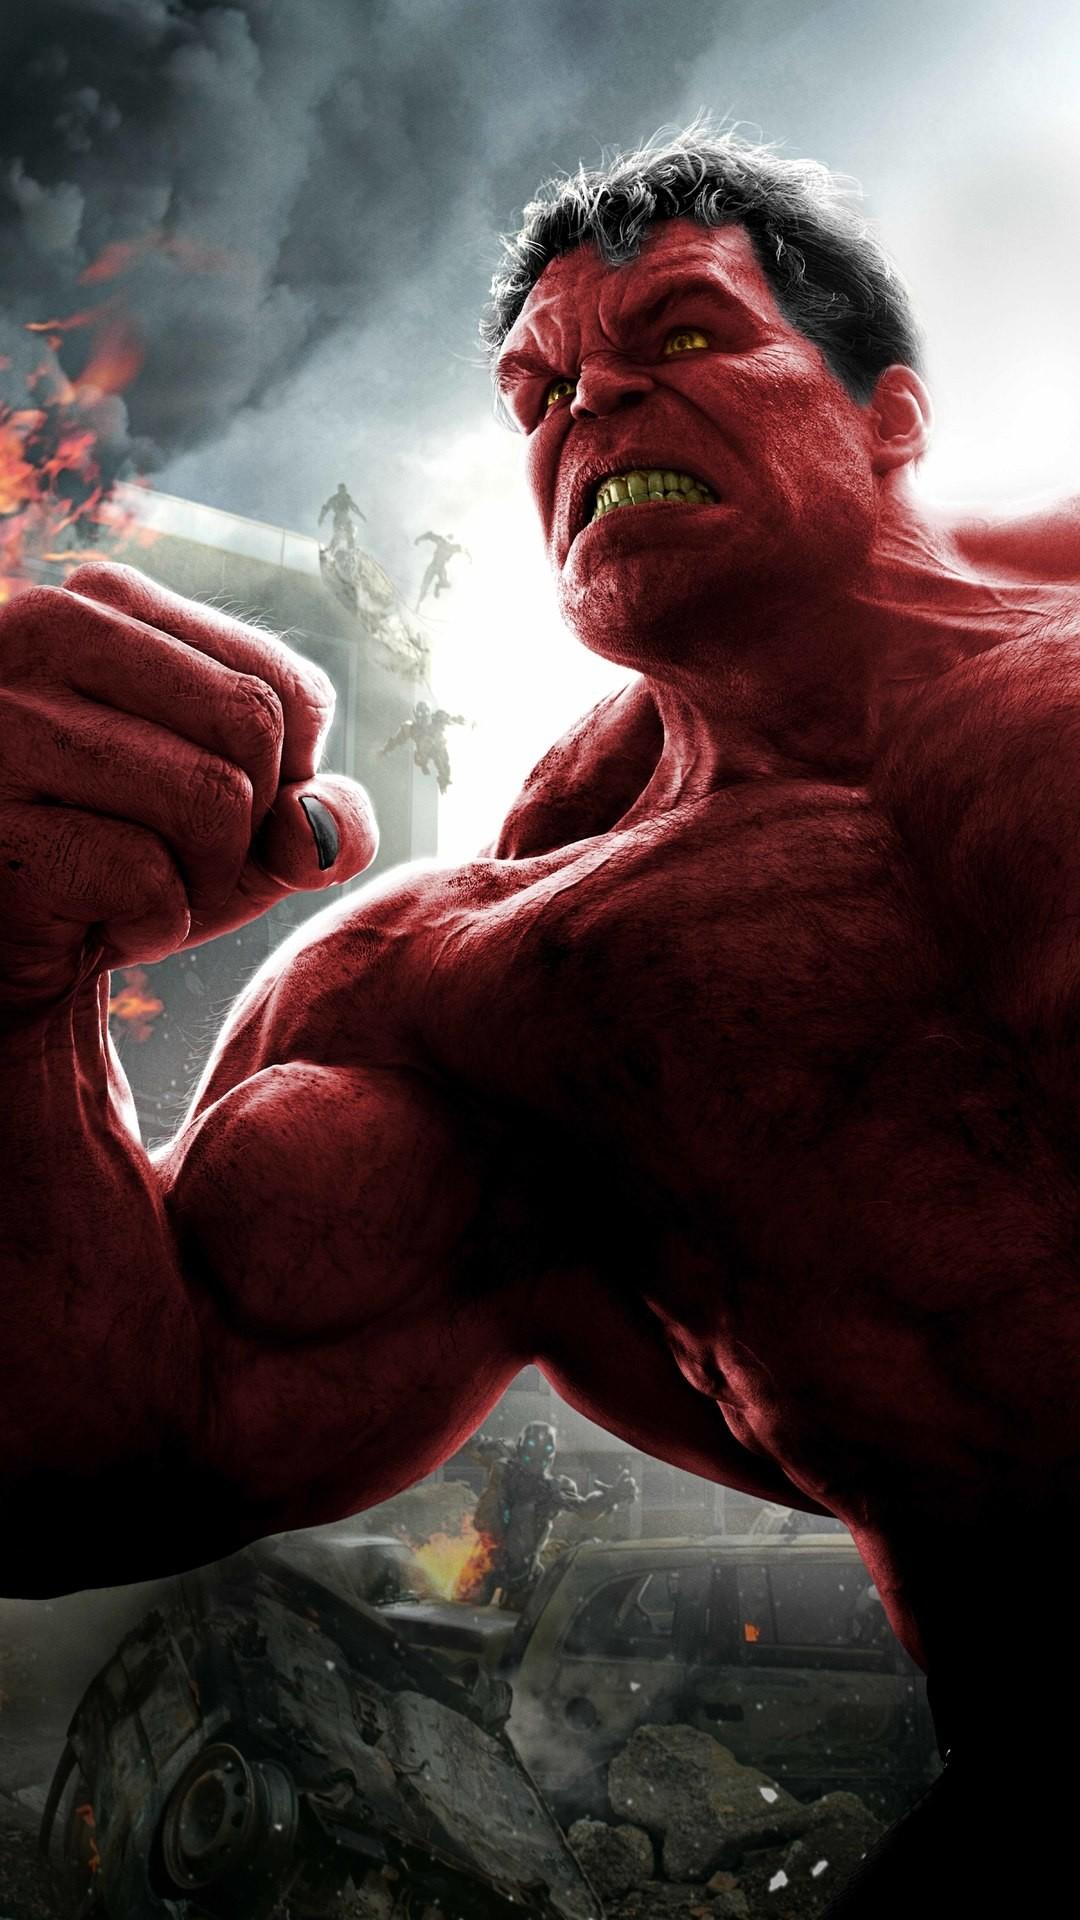 Res: 1080x1920, Red Hulk 8k (Iphone 7,6s,6 Plus, Pixel xl ,One Plus 3,3t,5)